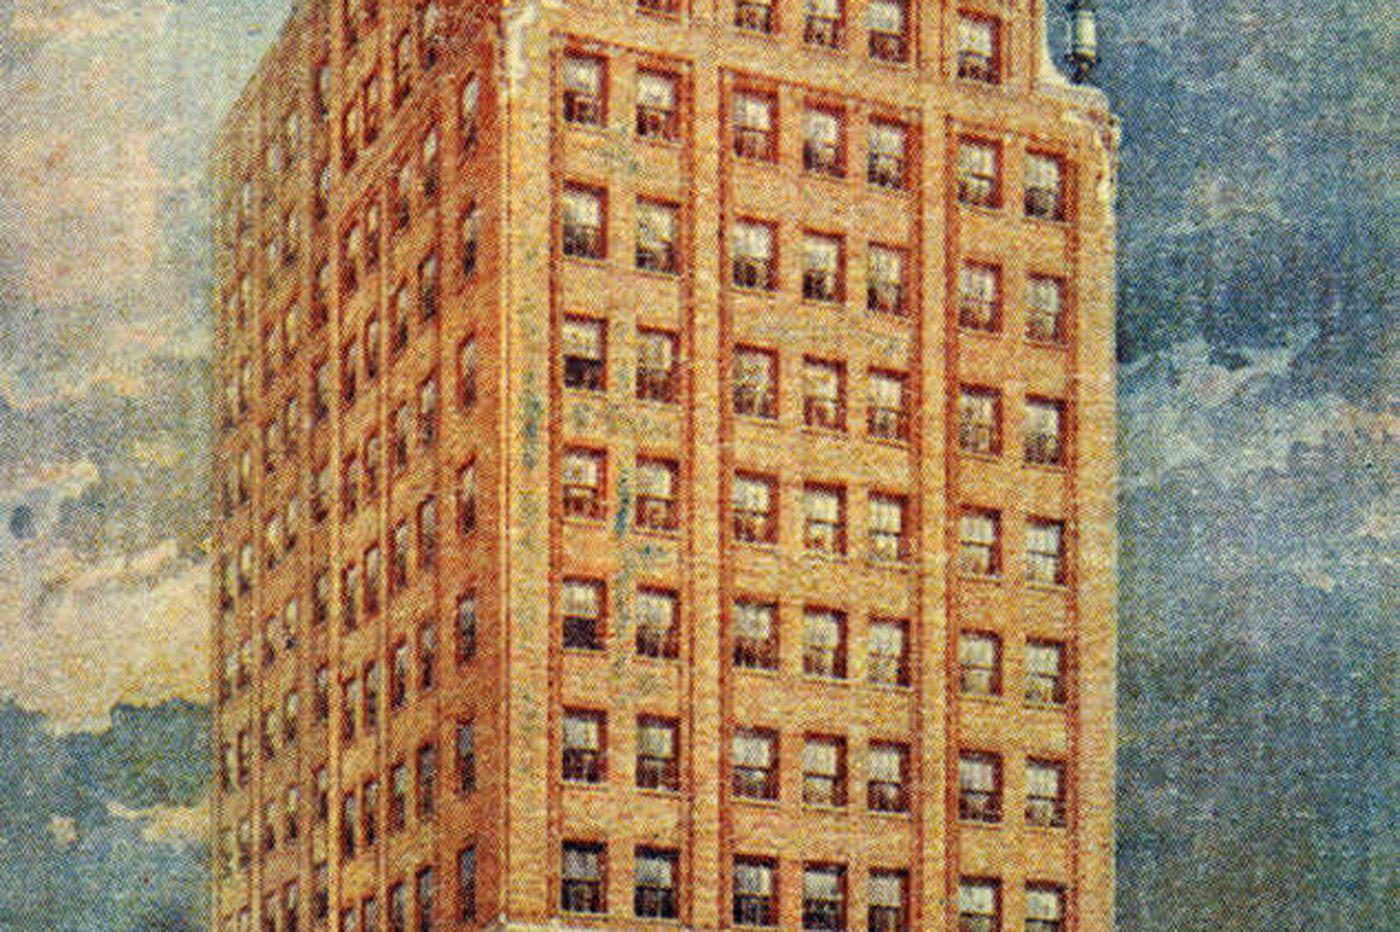 Memory stream Dipping into Philadelphia's illustrated past